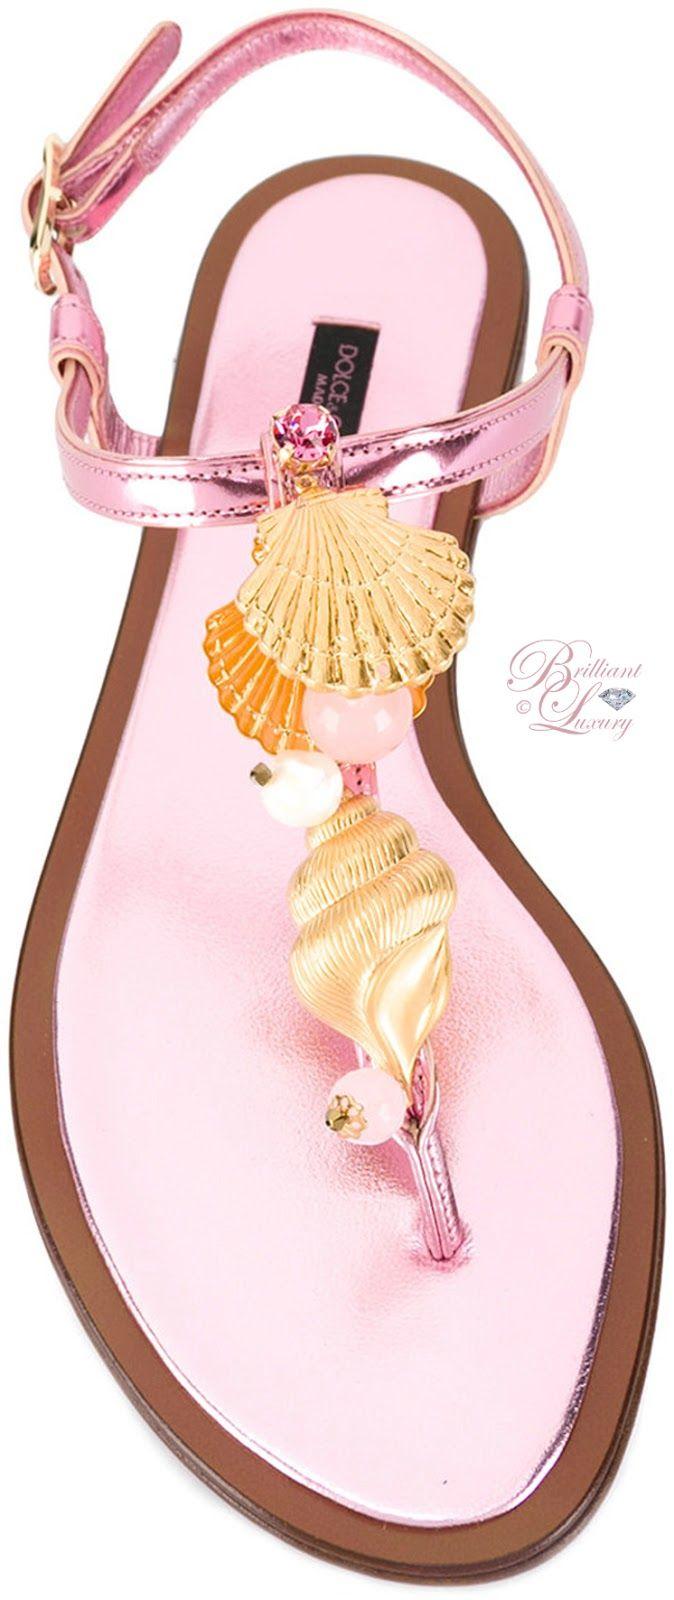 Brilliant Luxury by Emmy DE ♦ Dolce & Gabbana Golden Shell Sandals